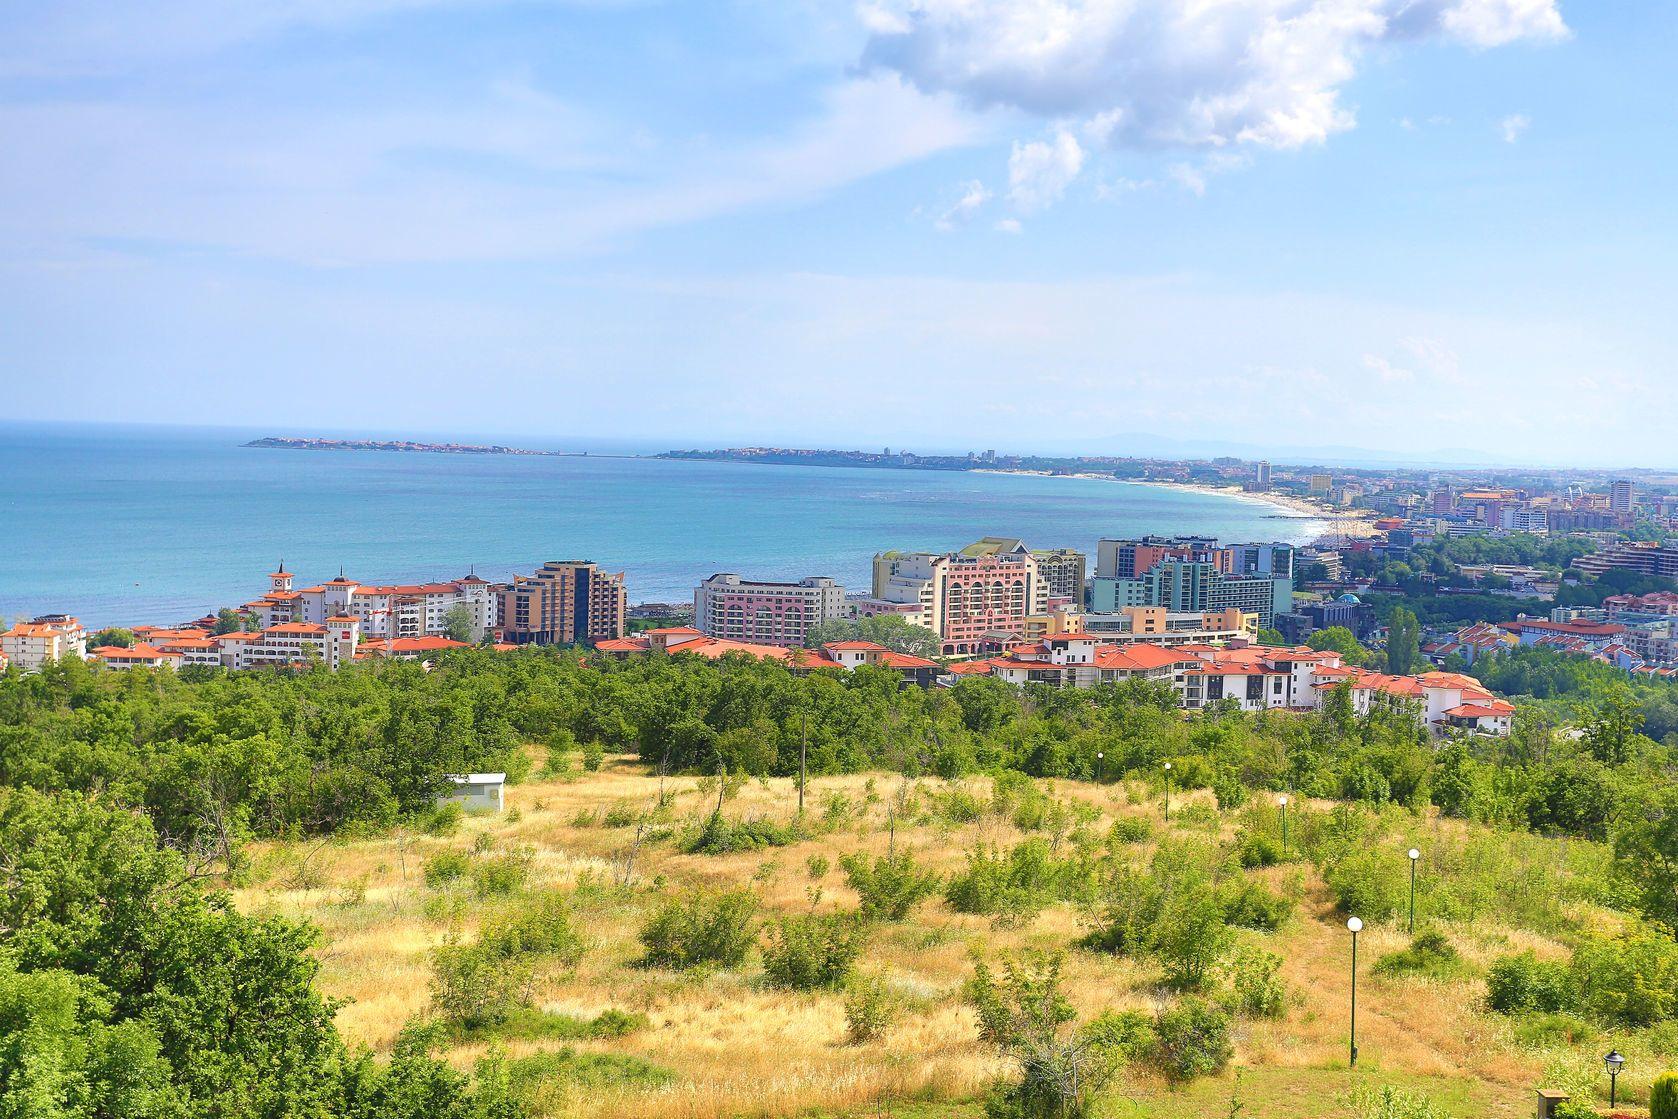 Pohled na město Burgas v Bulharsku | realperson/123RF.com